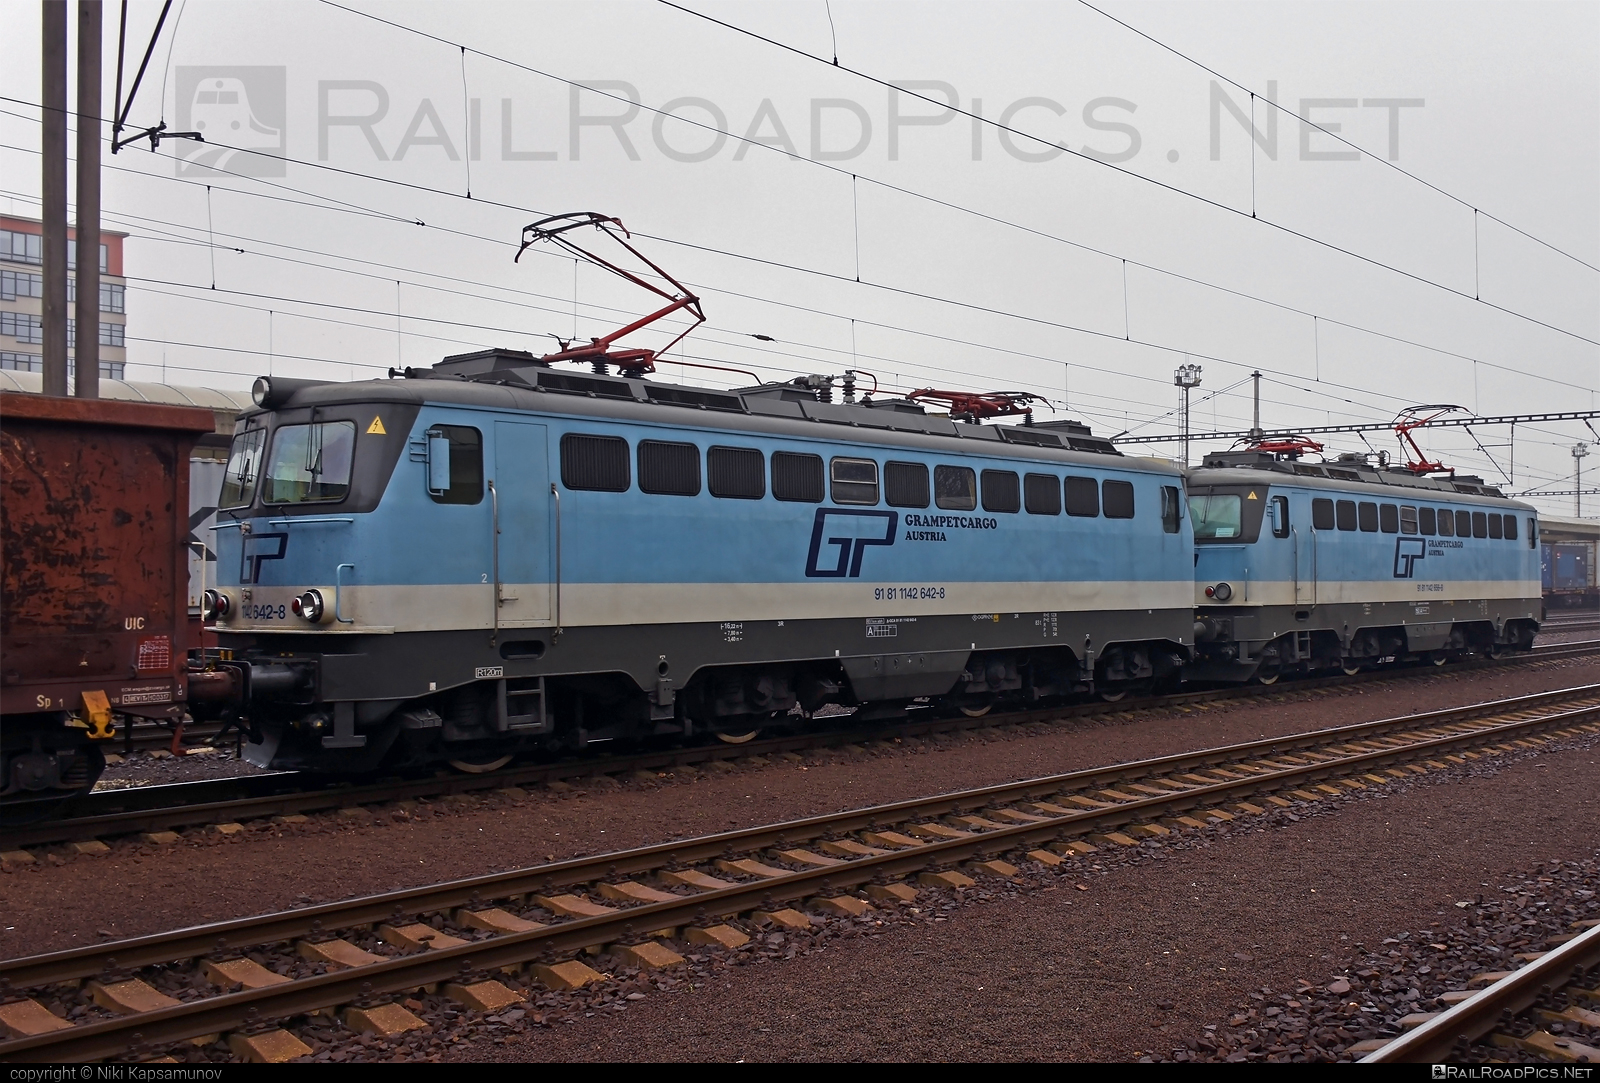 SGP ÖBB Class 1142 - 1142 642-8 operated by Grampetcargo Austria #GrampetcargoAustria #grampetcargo #obbclass1142 #sgp #sgp1142 #simmeringgrazpauker